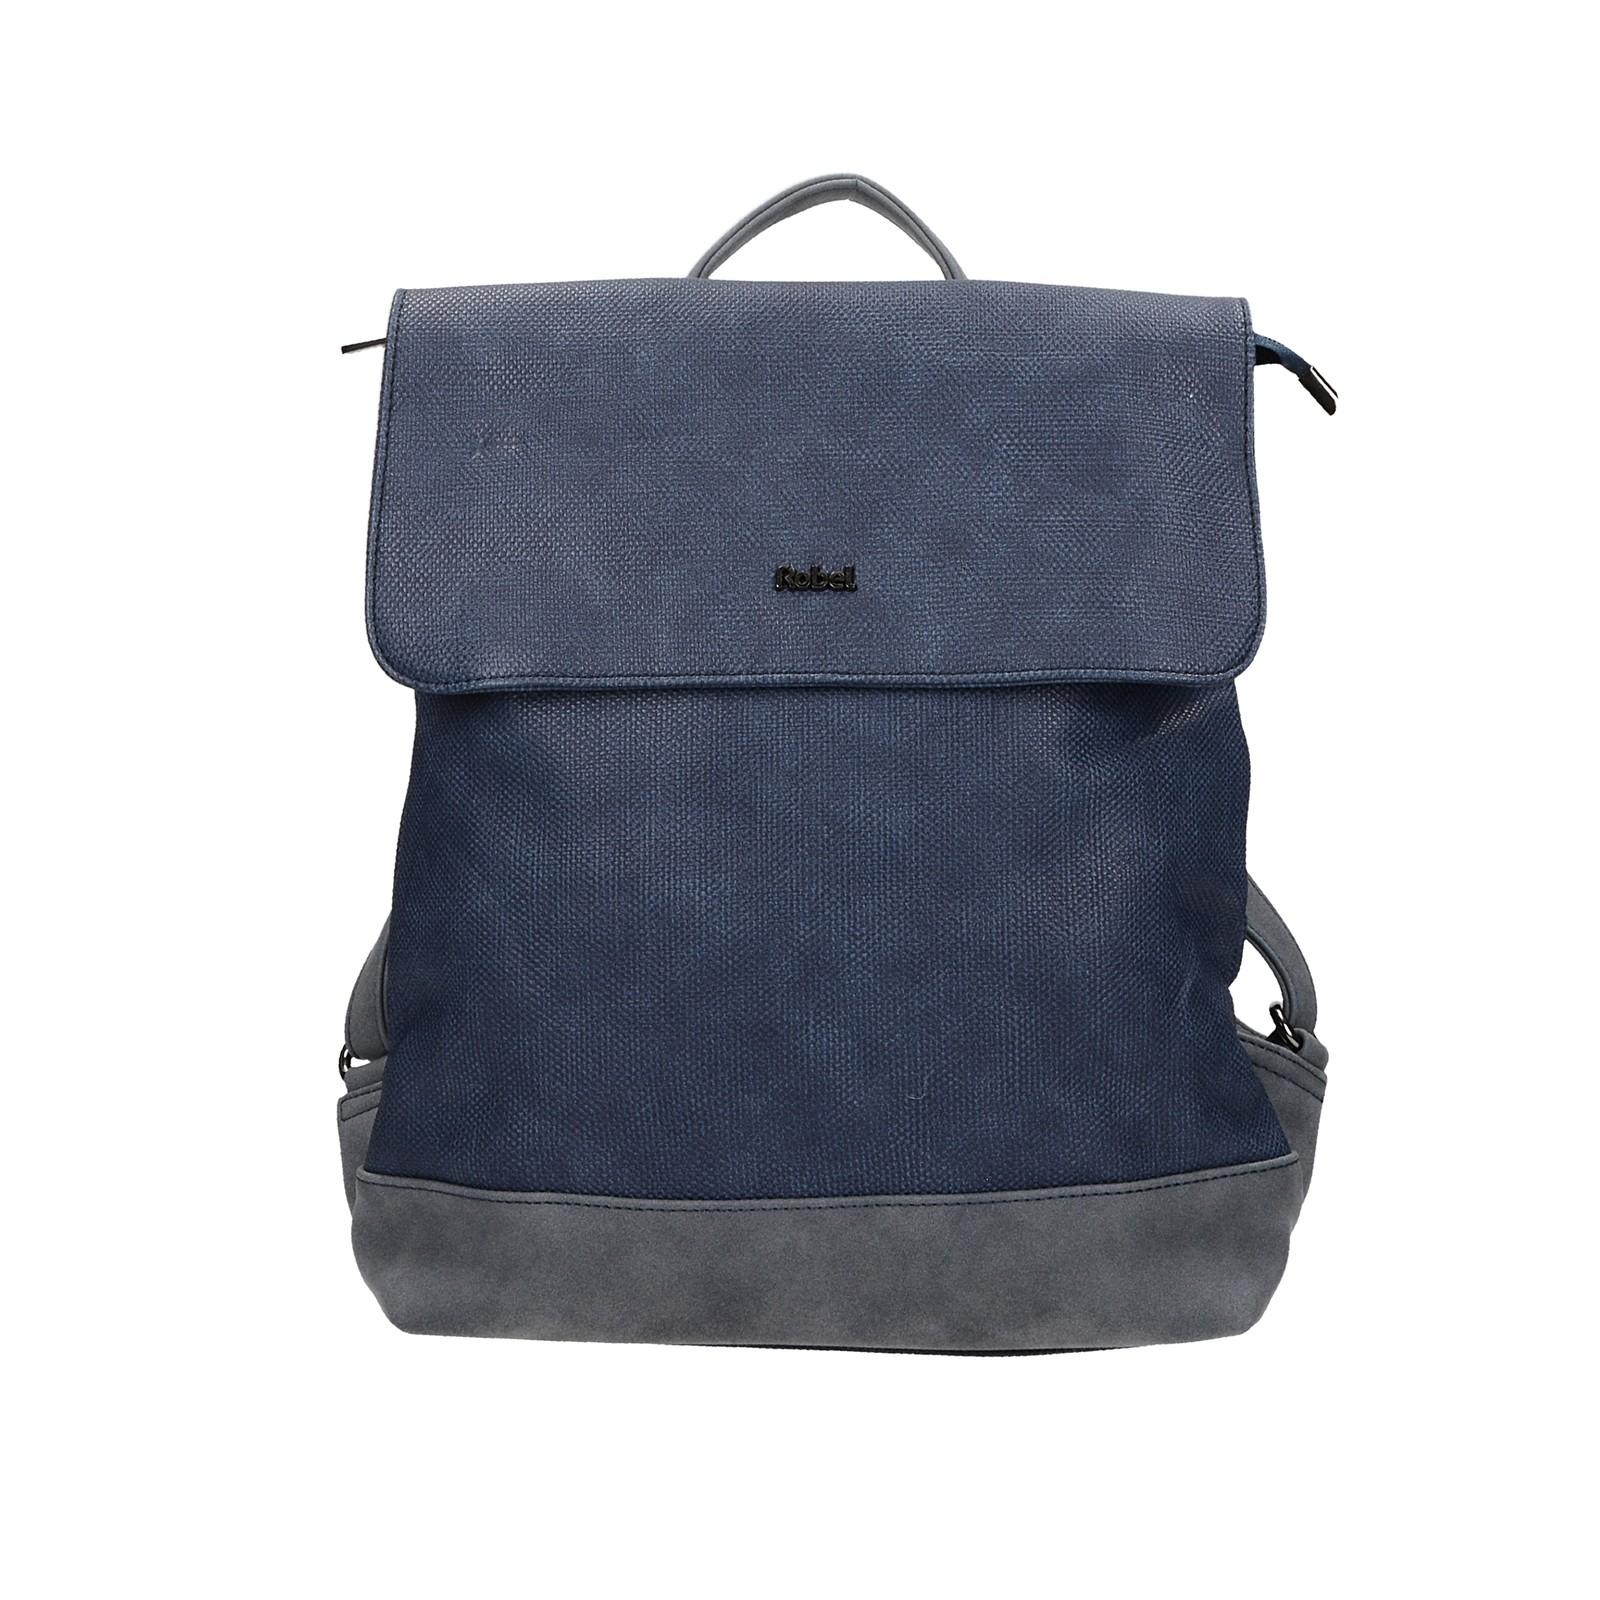 Robel dámsky štýlový ruksak - modrý Robel dámsky štýlový ruksak - modrý ... b36b1839af